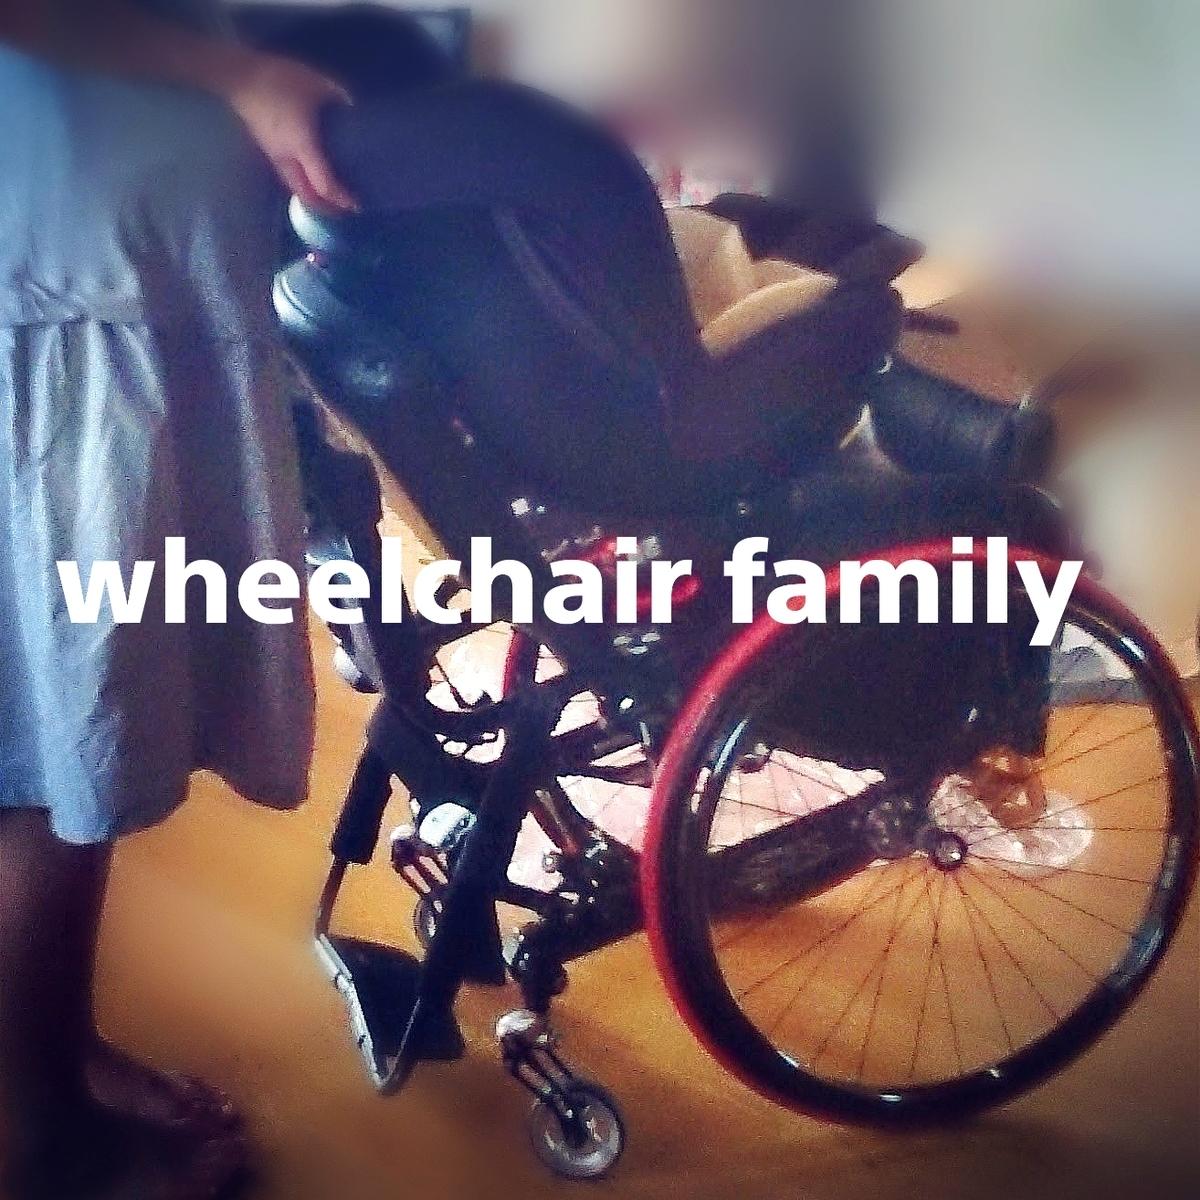 f:id:WheelchairFamily:20200611150704j:plain